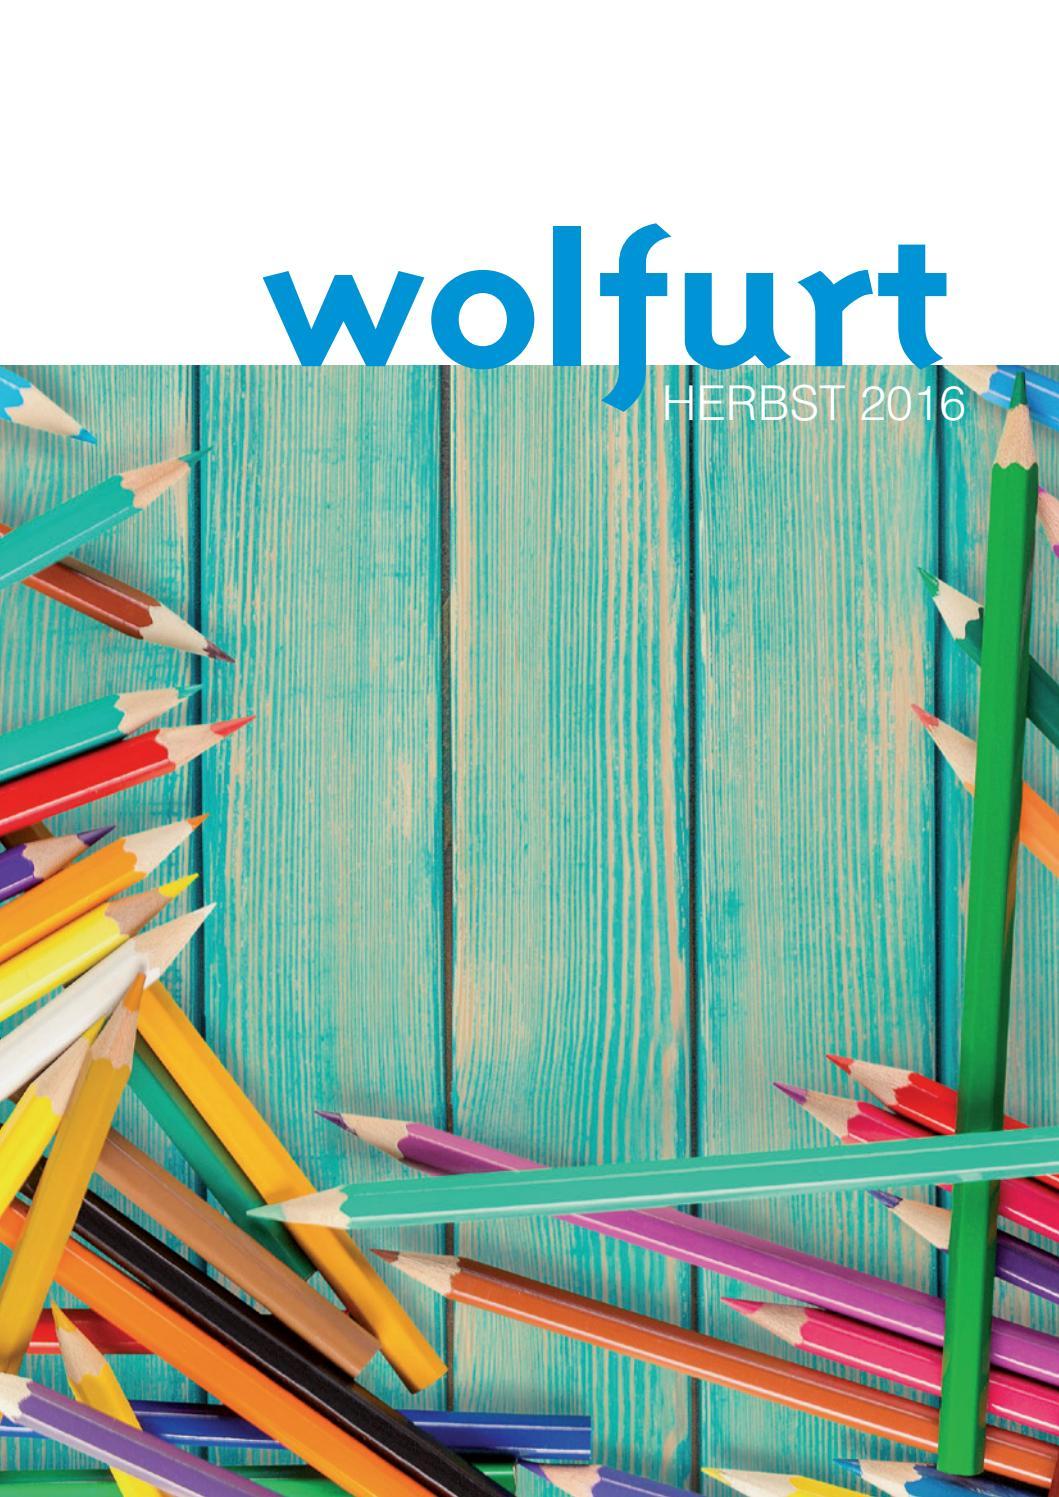 Wolfurt - Grne Vorarlberg - Die Grnen